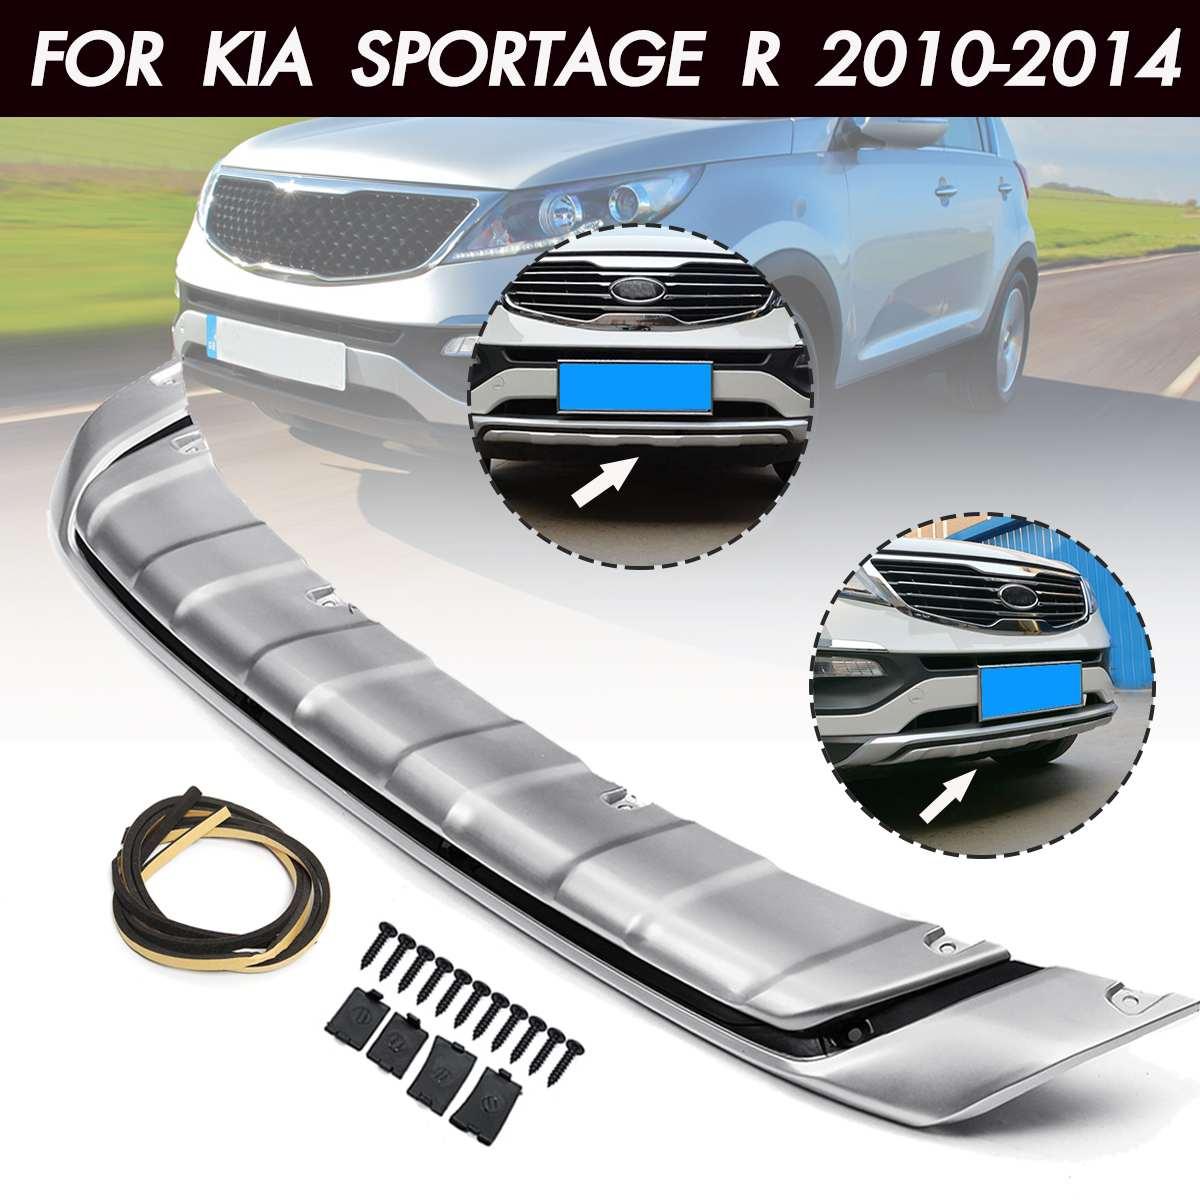 SAFE Chrome Rear Tail Light Lamp Cover Trim Molding 4-pc Set For 2011 2012 2013 Kia Sportage R